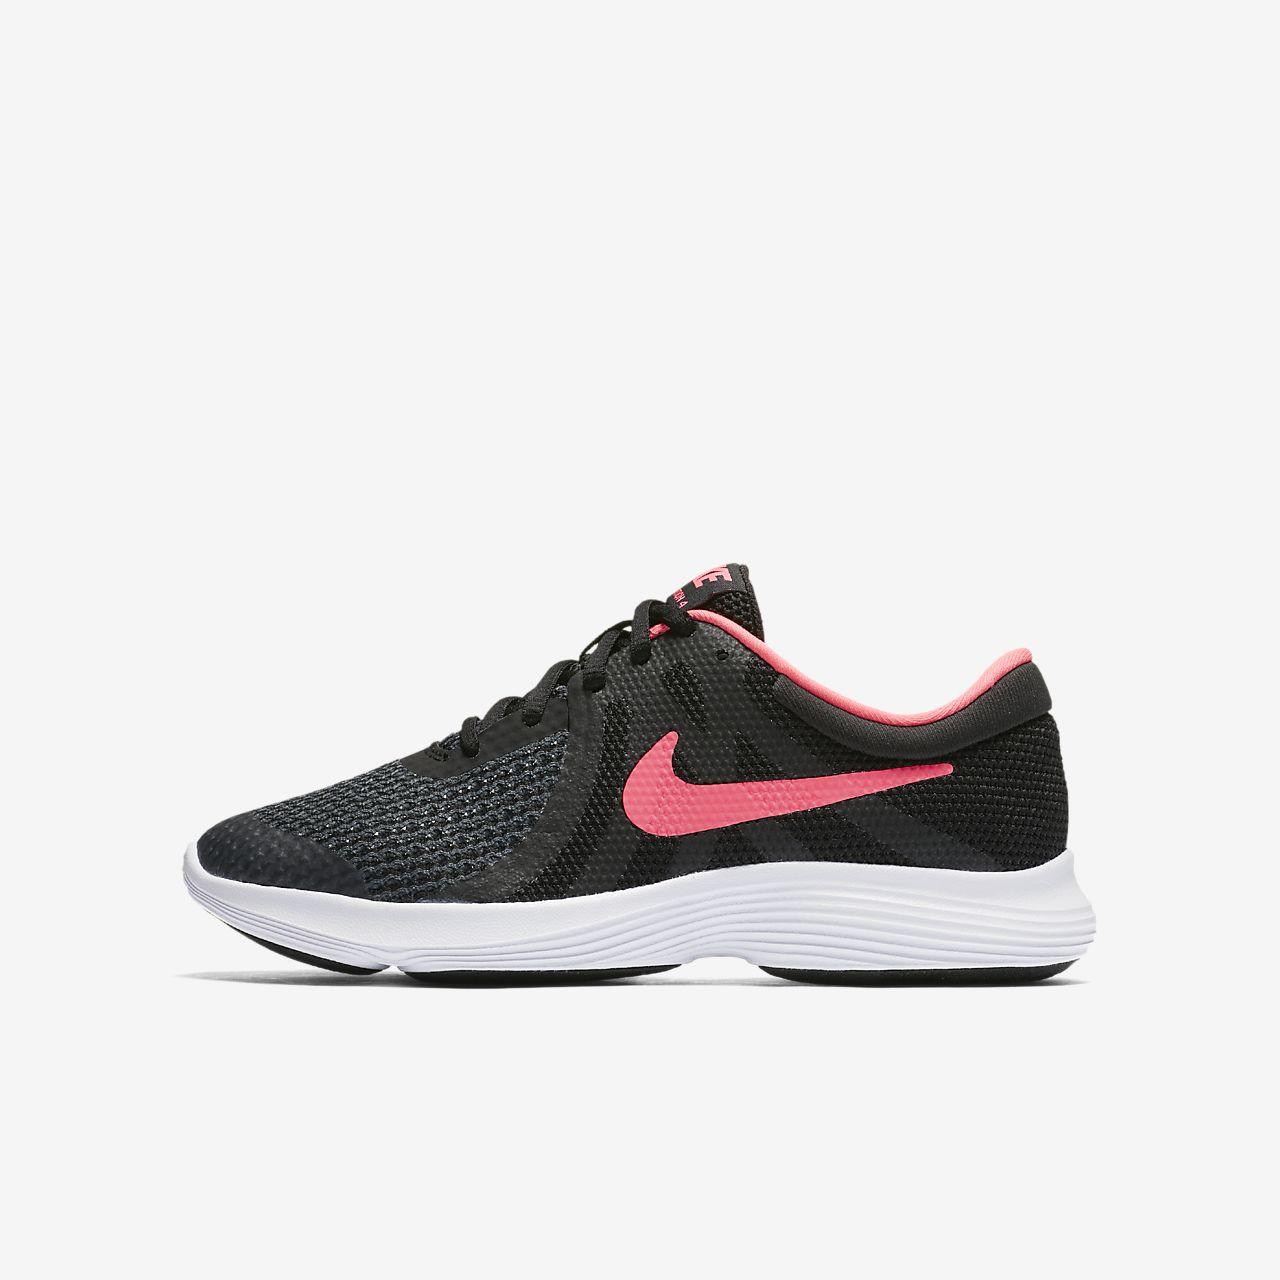 6f7b8cdbf1a Nike Revolution 4 Zapatillas de running - Niño a. Nike.com ES